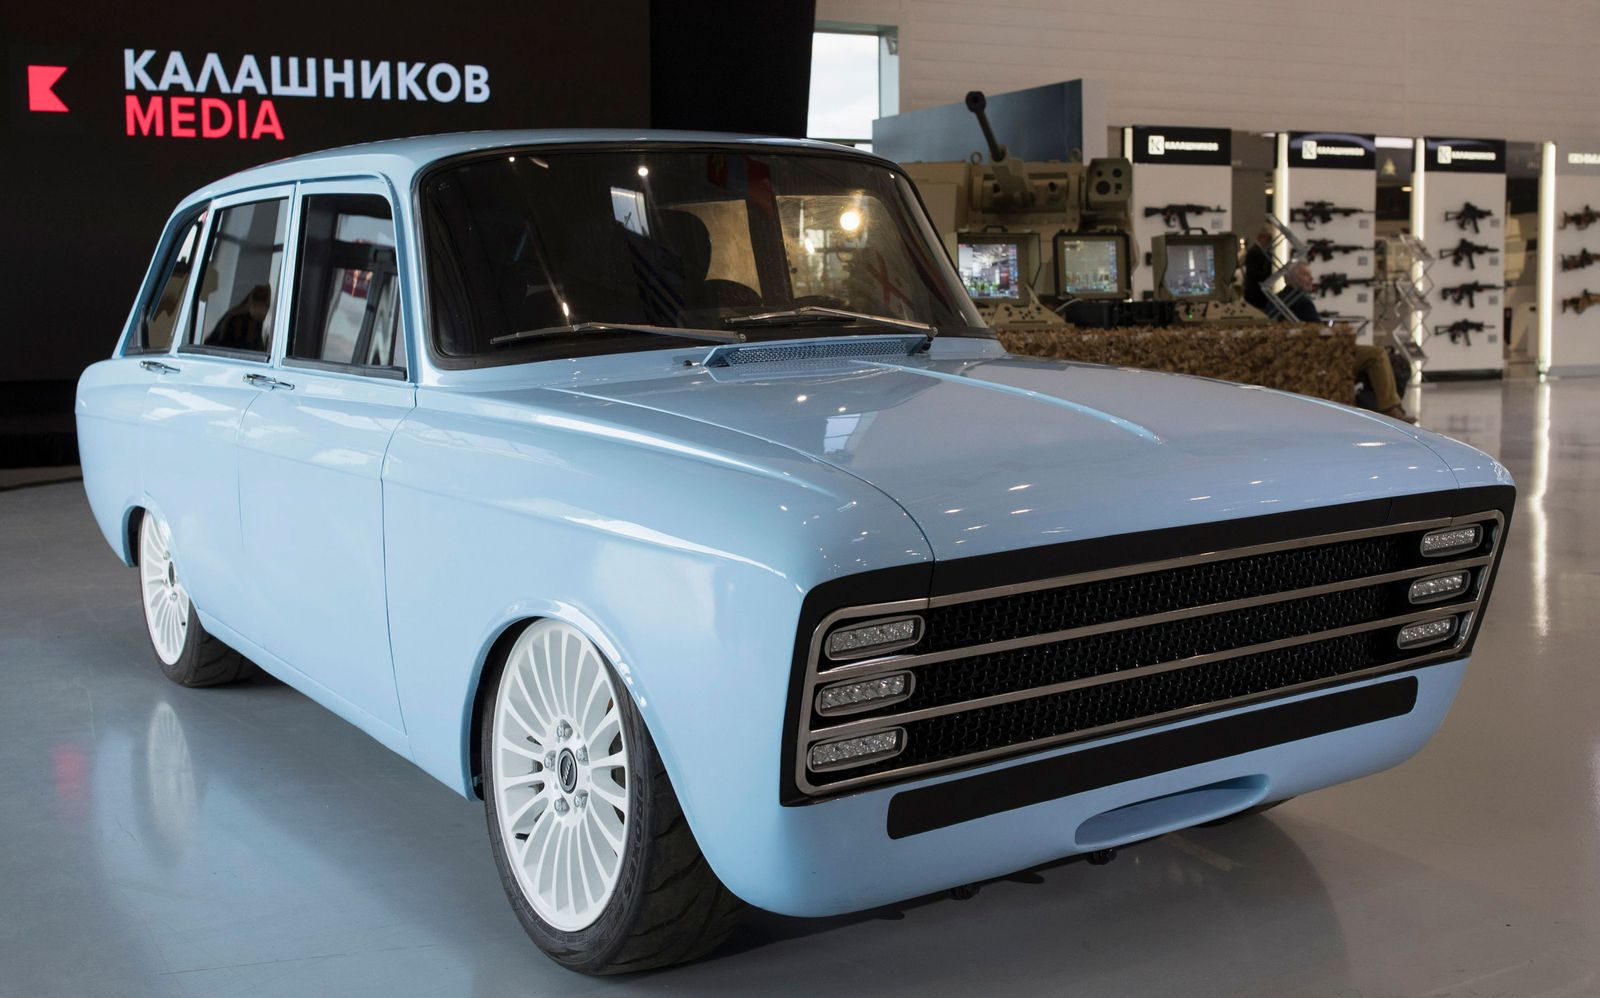 RUSSIA-AUTOMOBILE-TECHNOLOGY